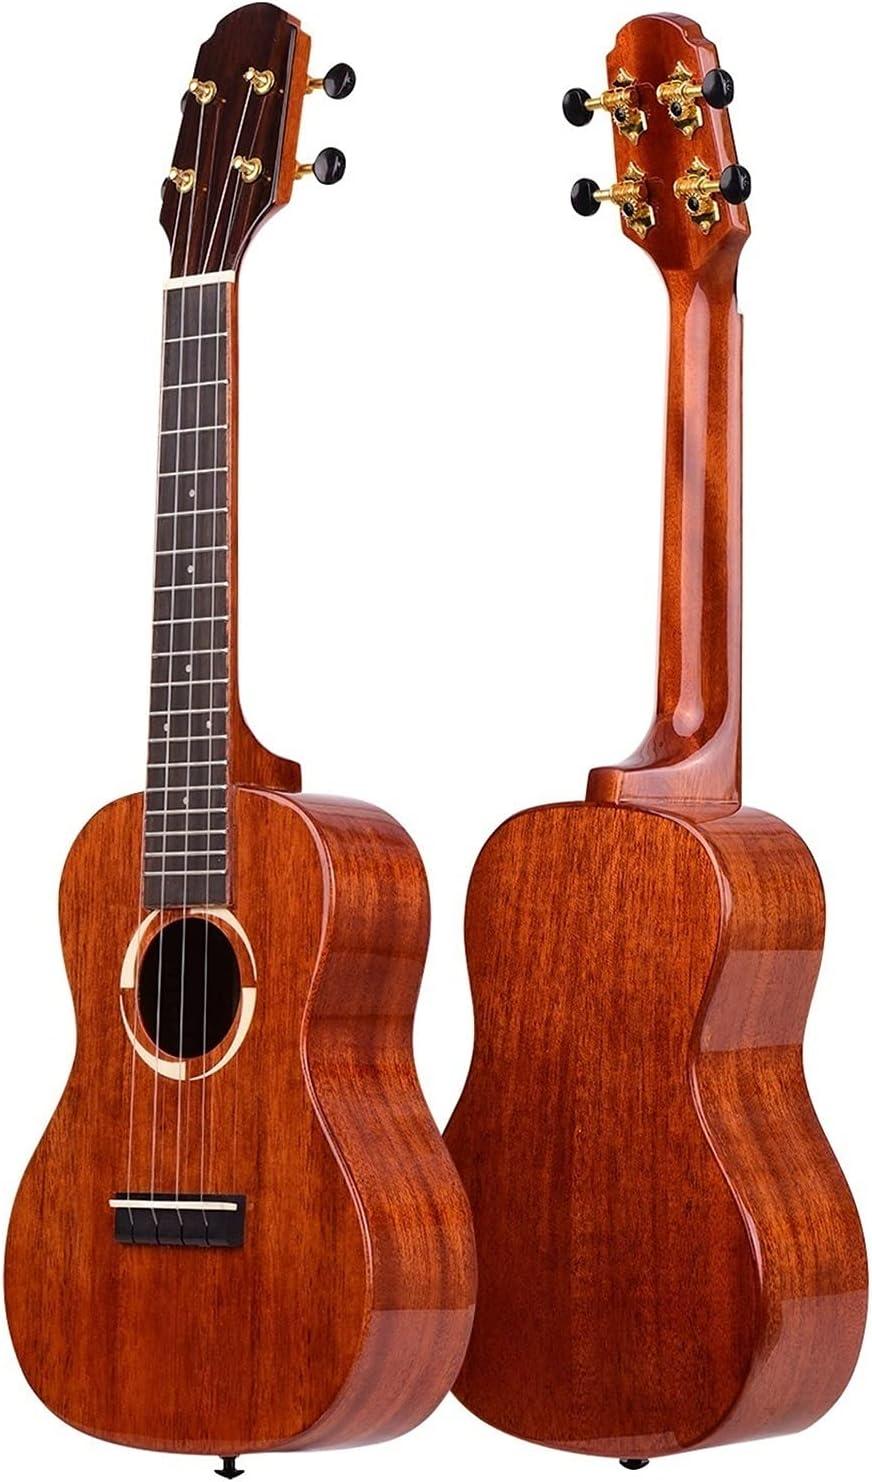 23 Inch Concert Ukulele Solid Wood Varnish Nashville-Davidson Mall Topboard New products, world's highest quality popular! Sur Specular